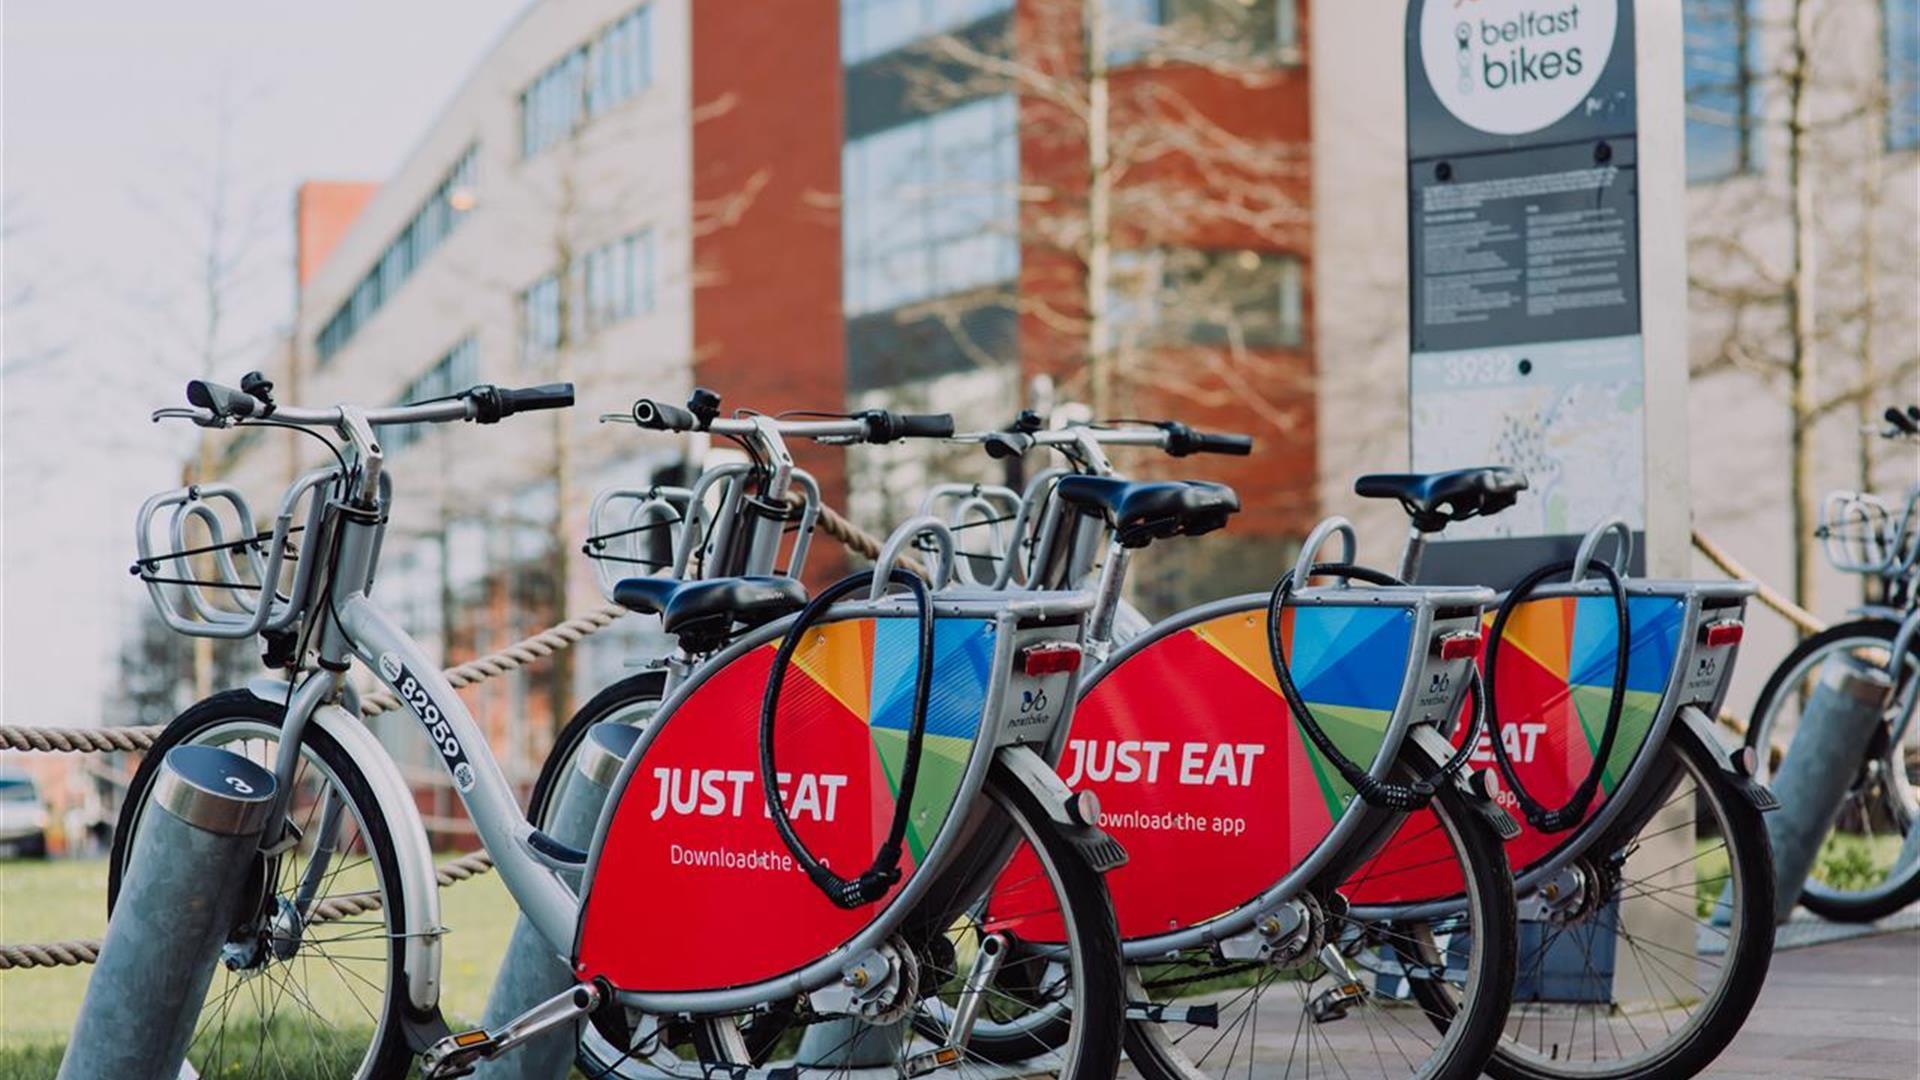 Belfast Bikes: Public Cycle Hire